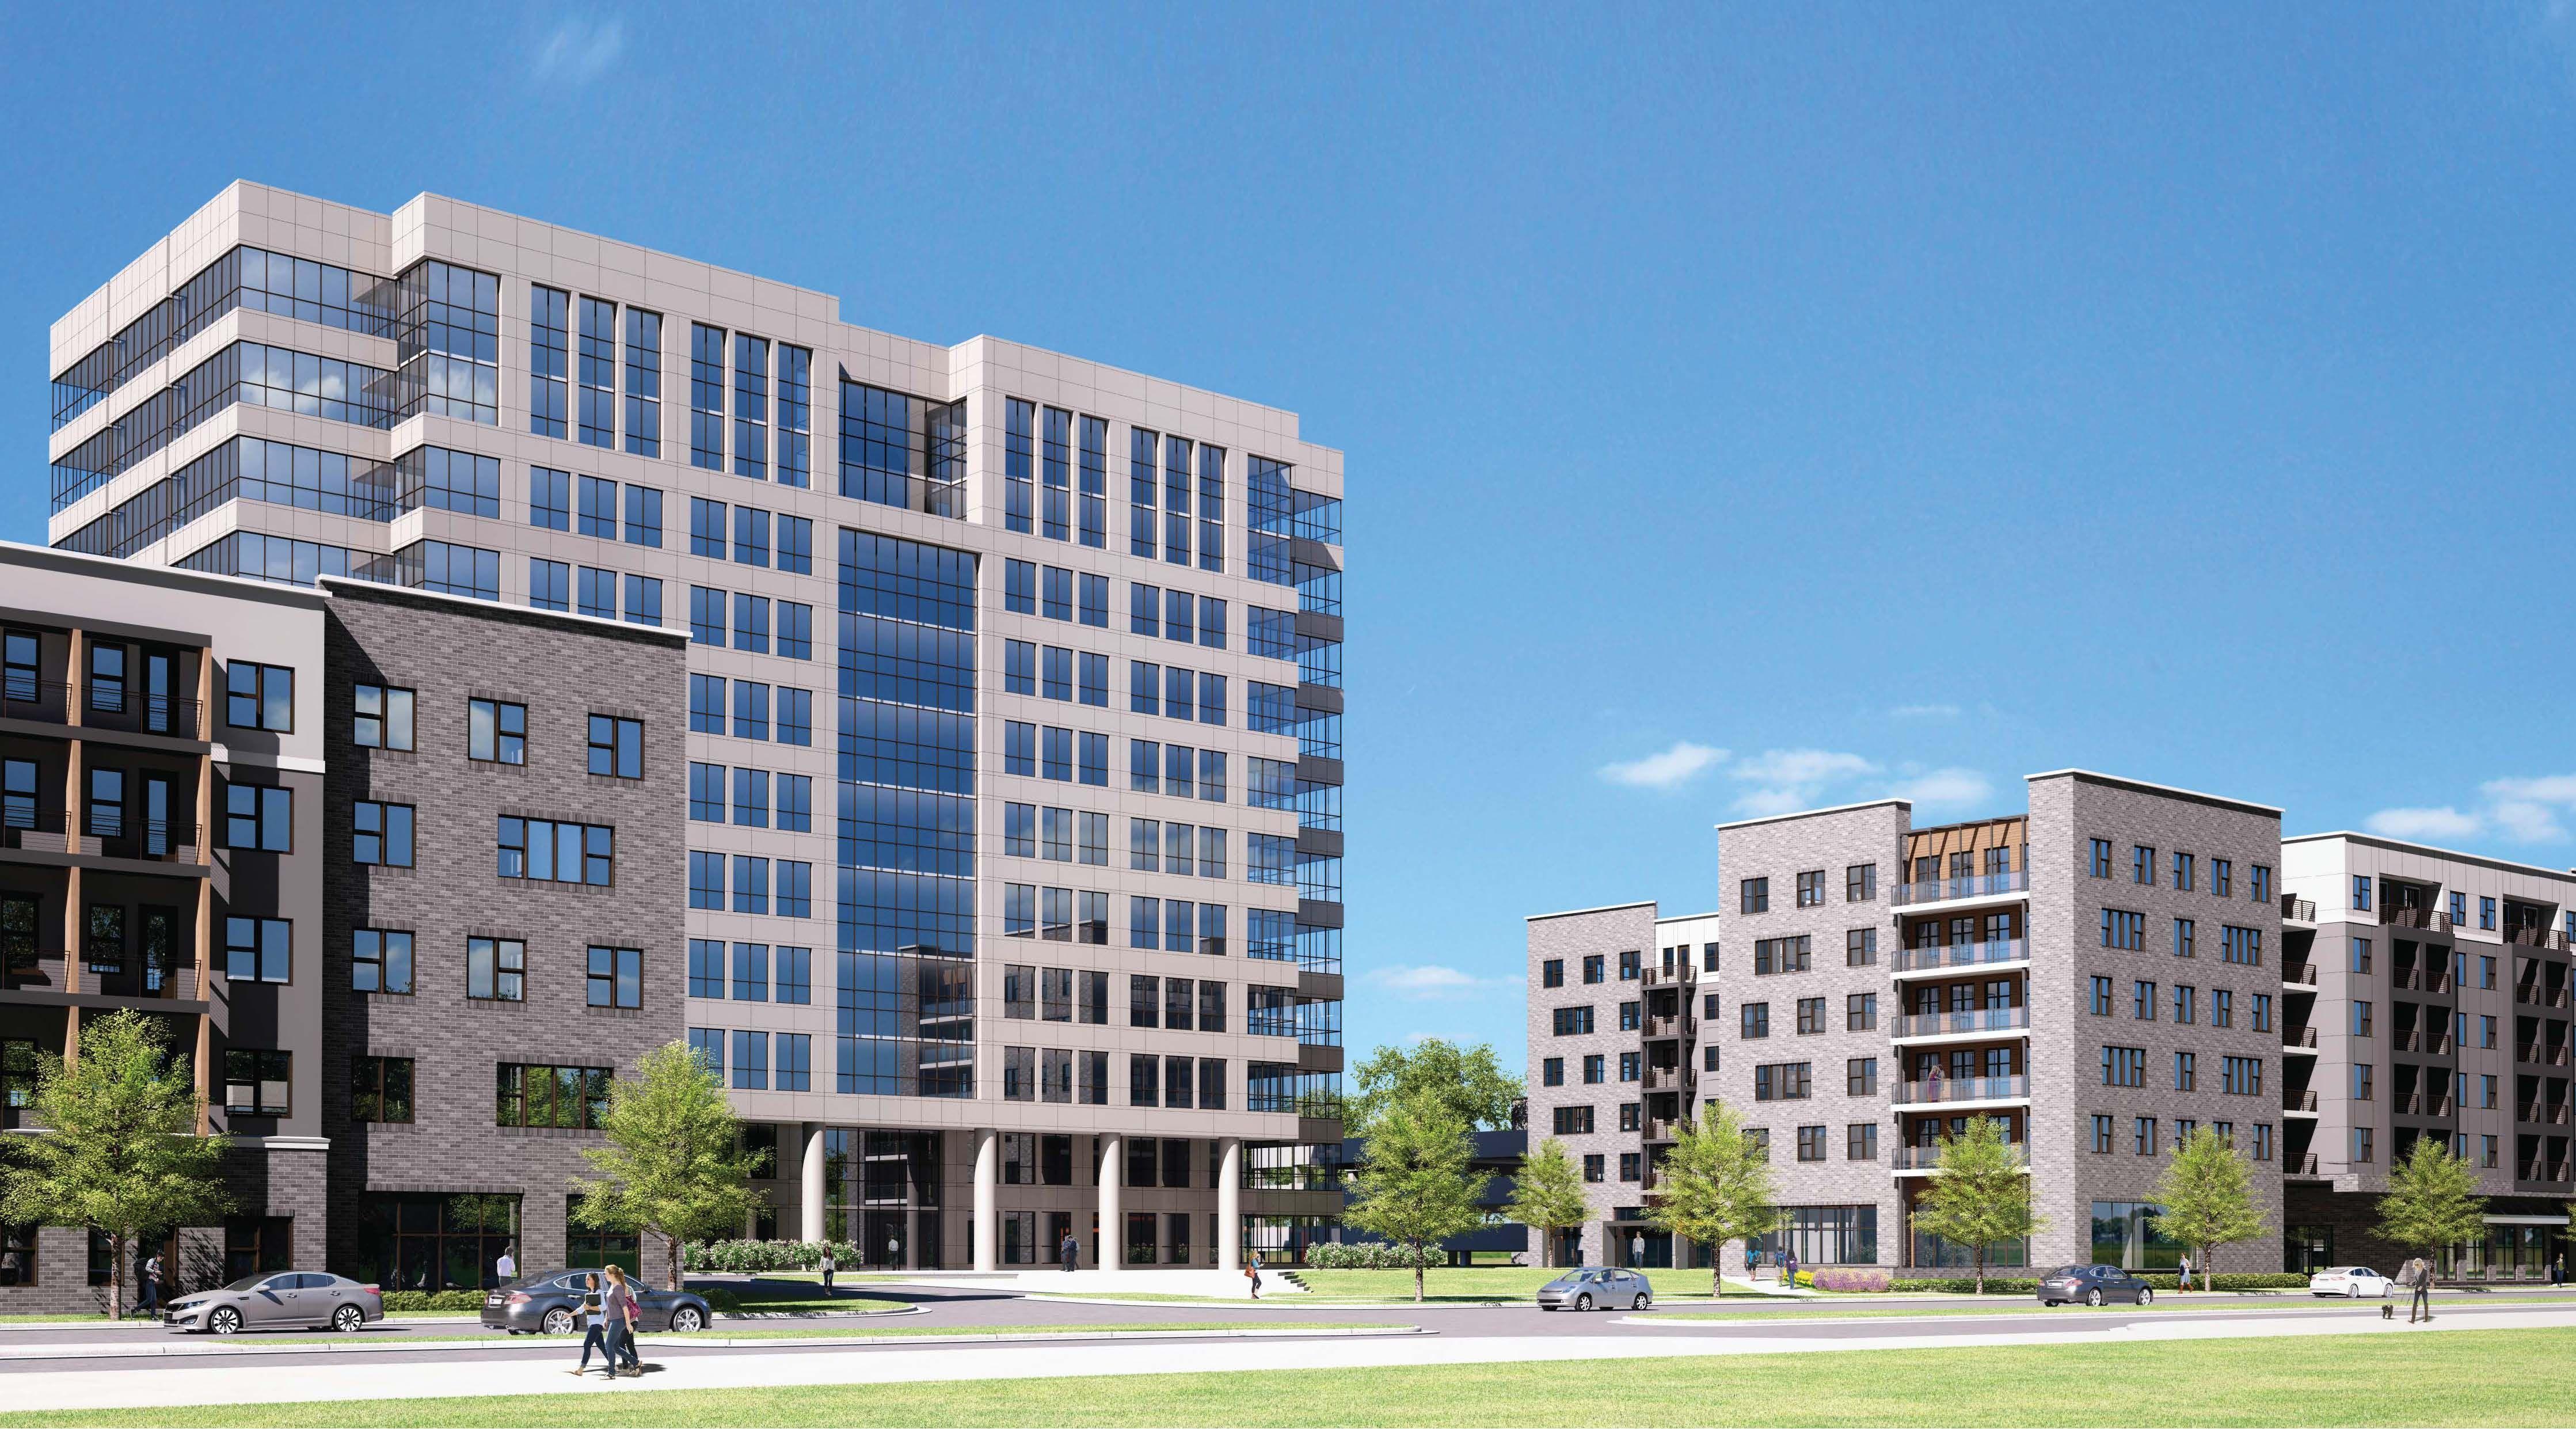 Developer plans apartments at Sandy Springs office park www.ajc.com ...